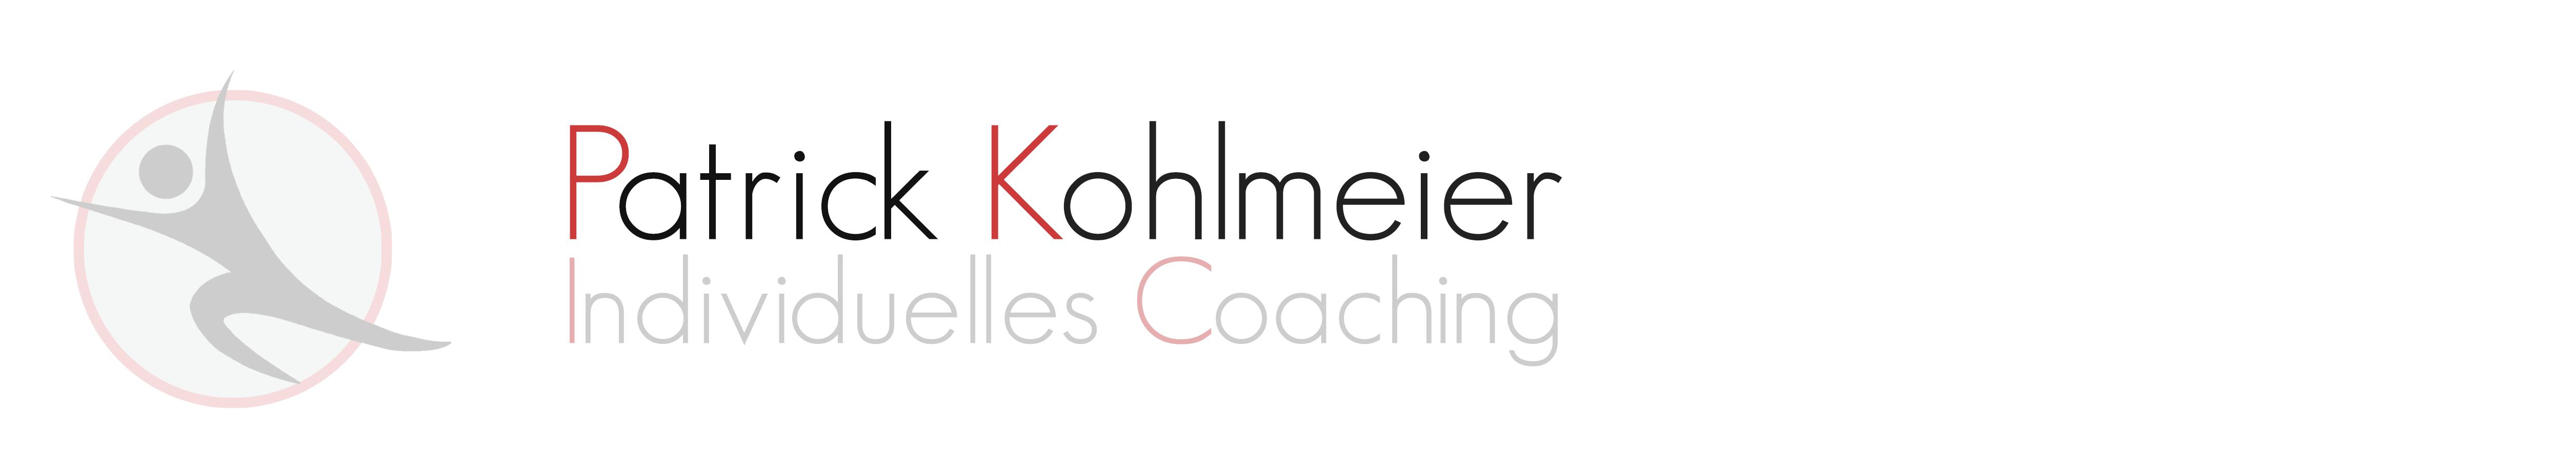 Patrick Kohlmeier - Individuelles Coaching